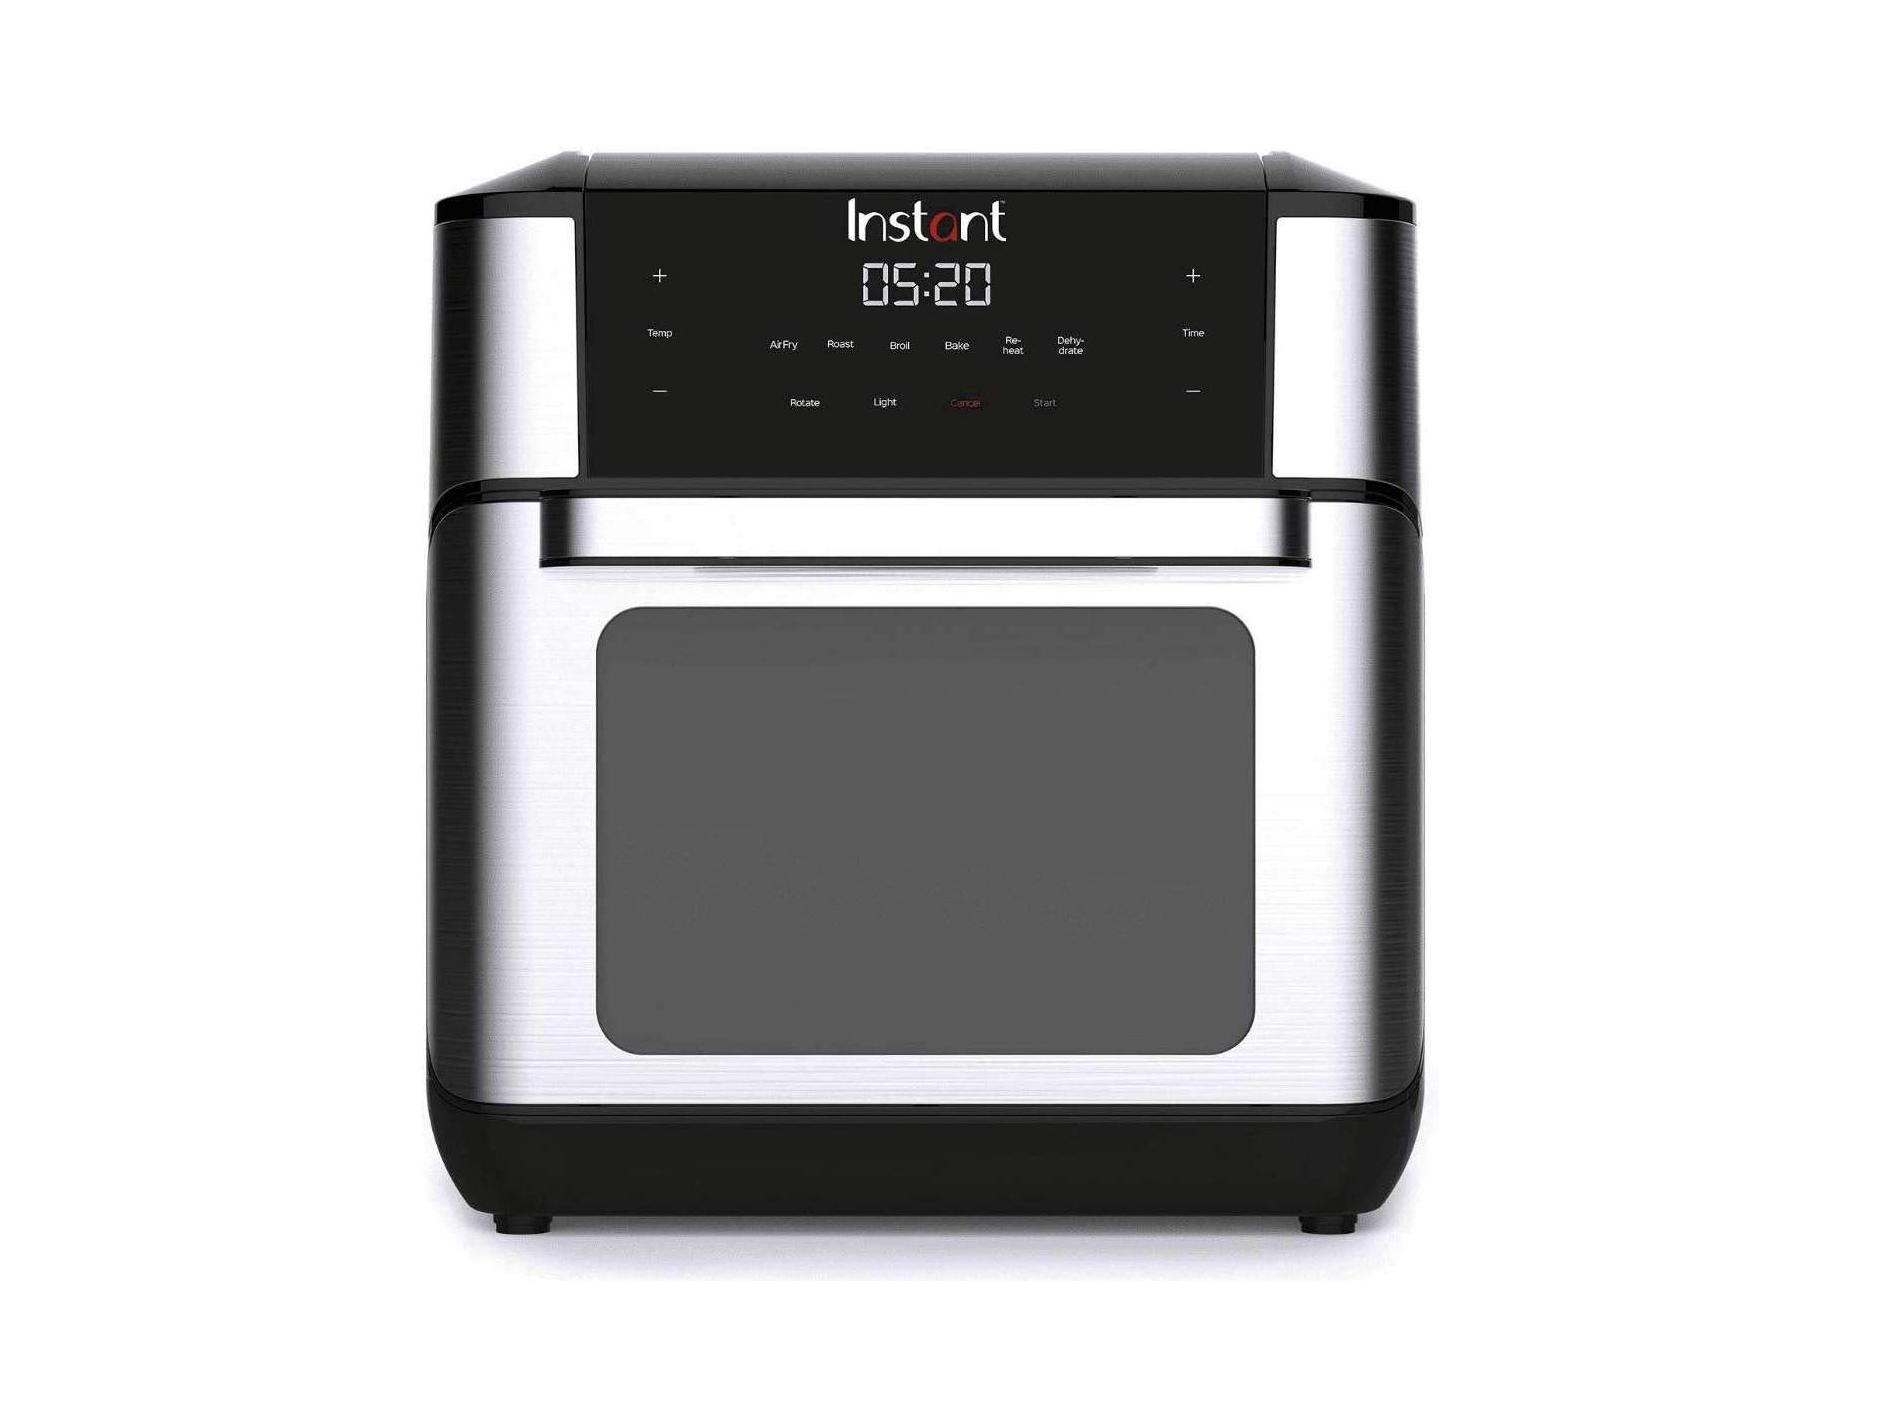 Amazon Instant Vortex Plus 7-in-1 Air Fryer Oven